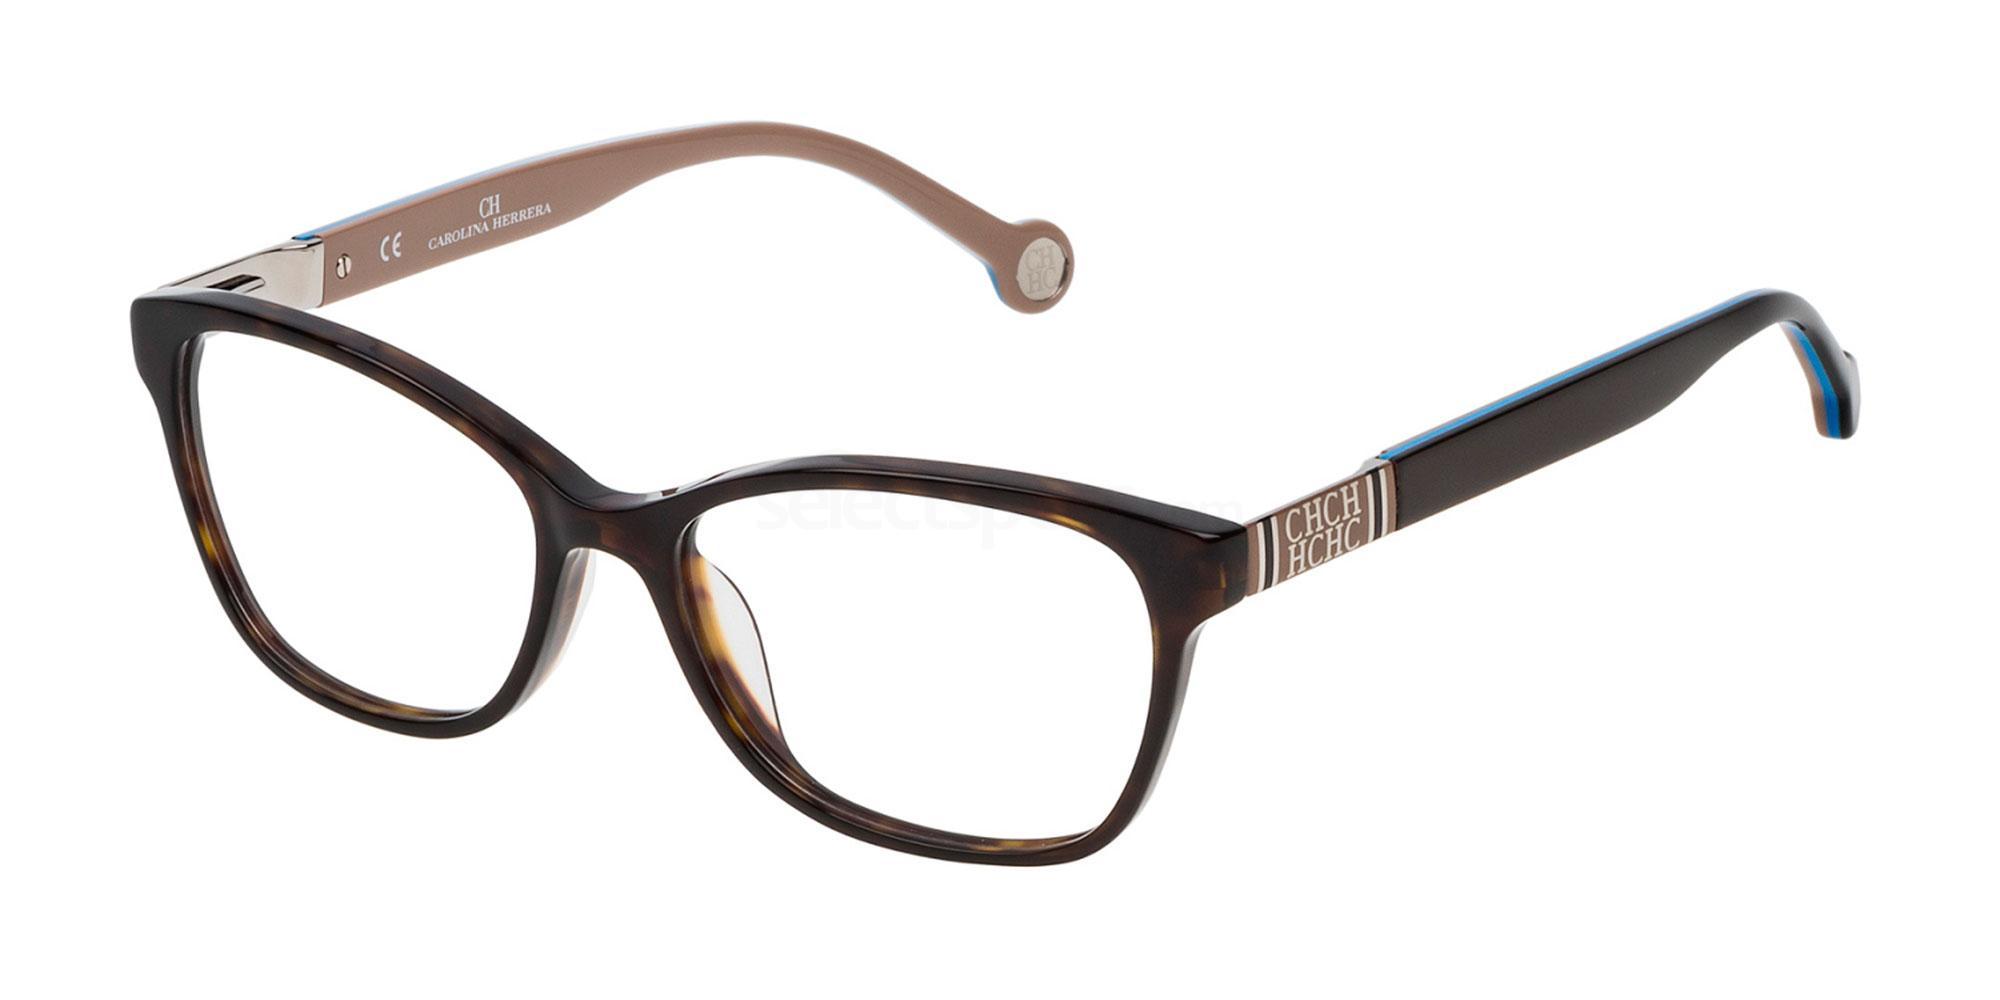 0722 VHE709 Glasses, CH Carolina Herrera